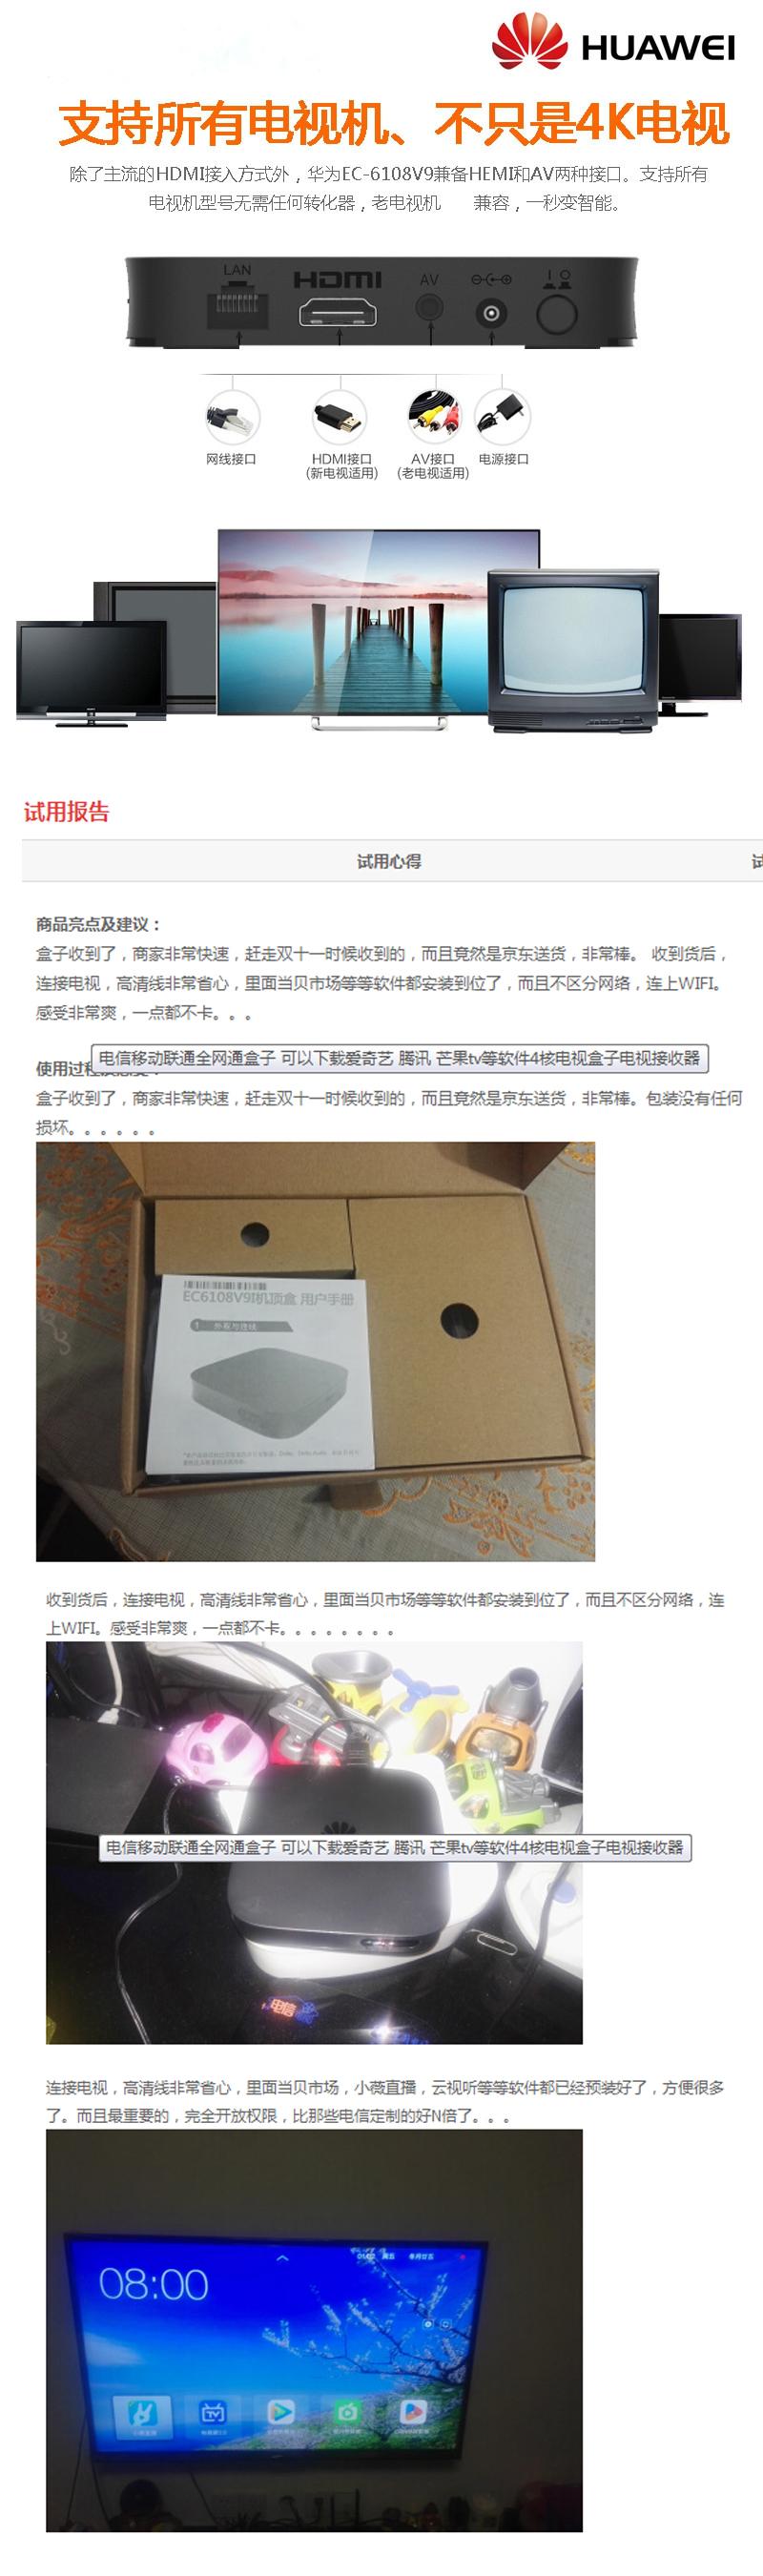 Huawei Hyatt Box v9 HD 4k TV Box Live HD Network Top Box Smart